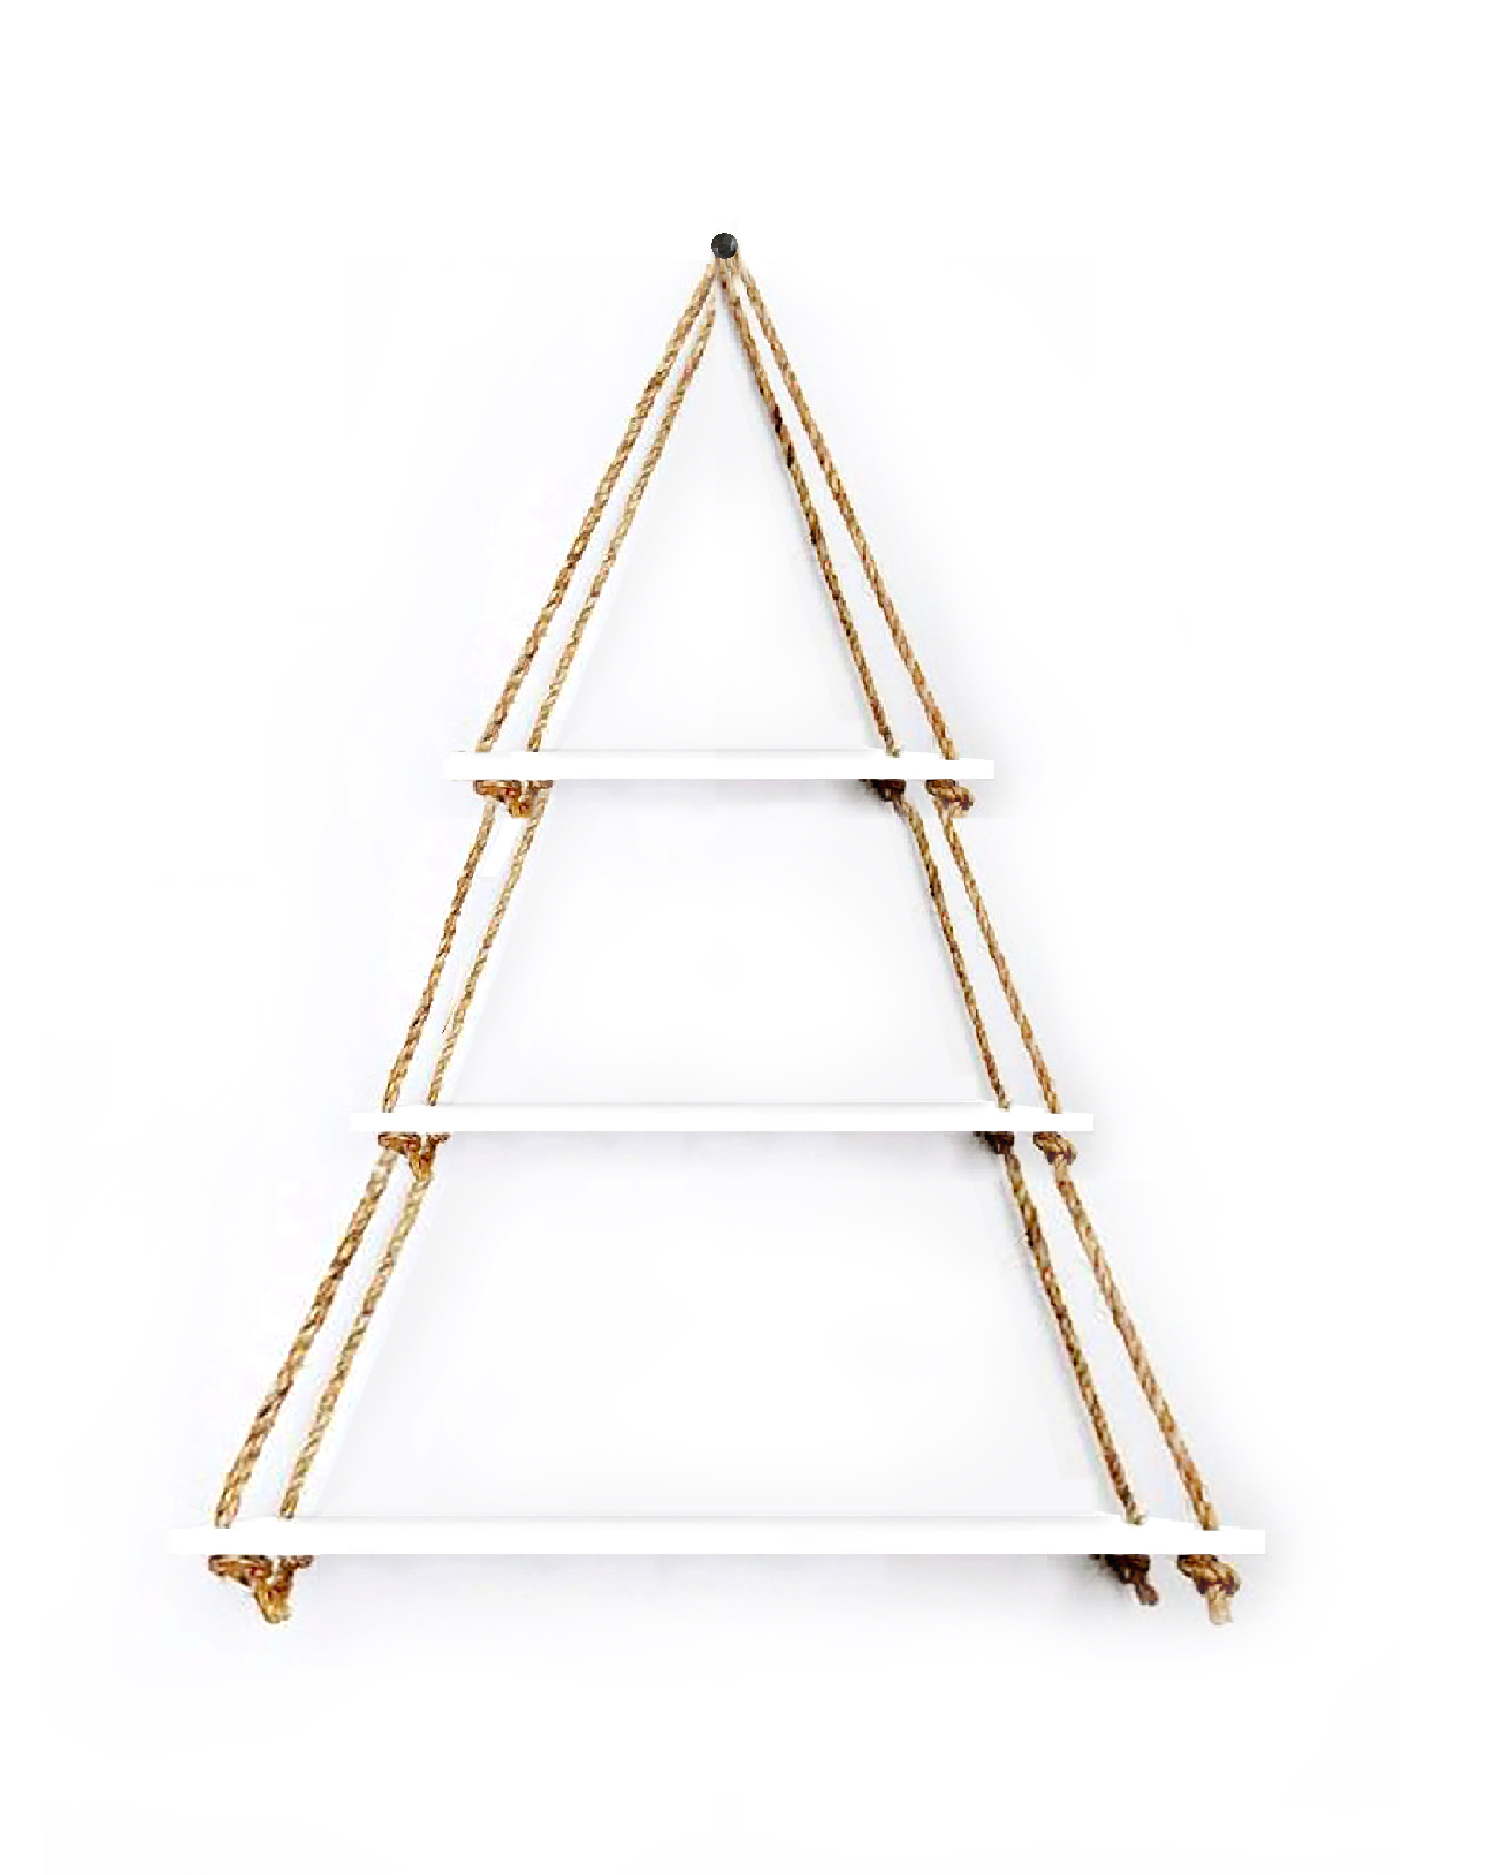 VAH Wall Hanging Shelf, Set of 3 Wood Floating Shelves for Wall Rustic Rope Shelves Plant Shelf Farmhouse Decor for Liv